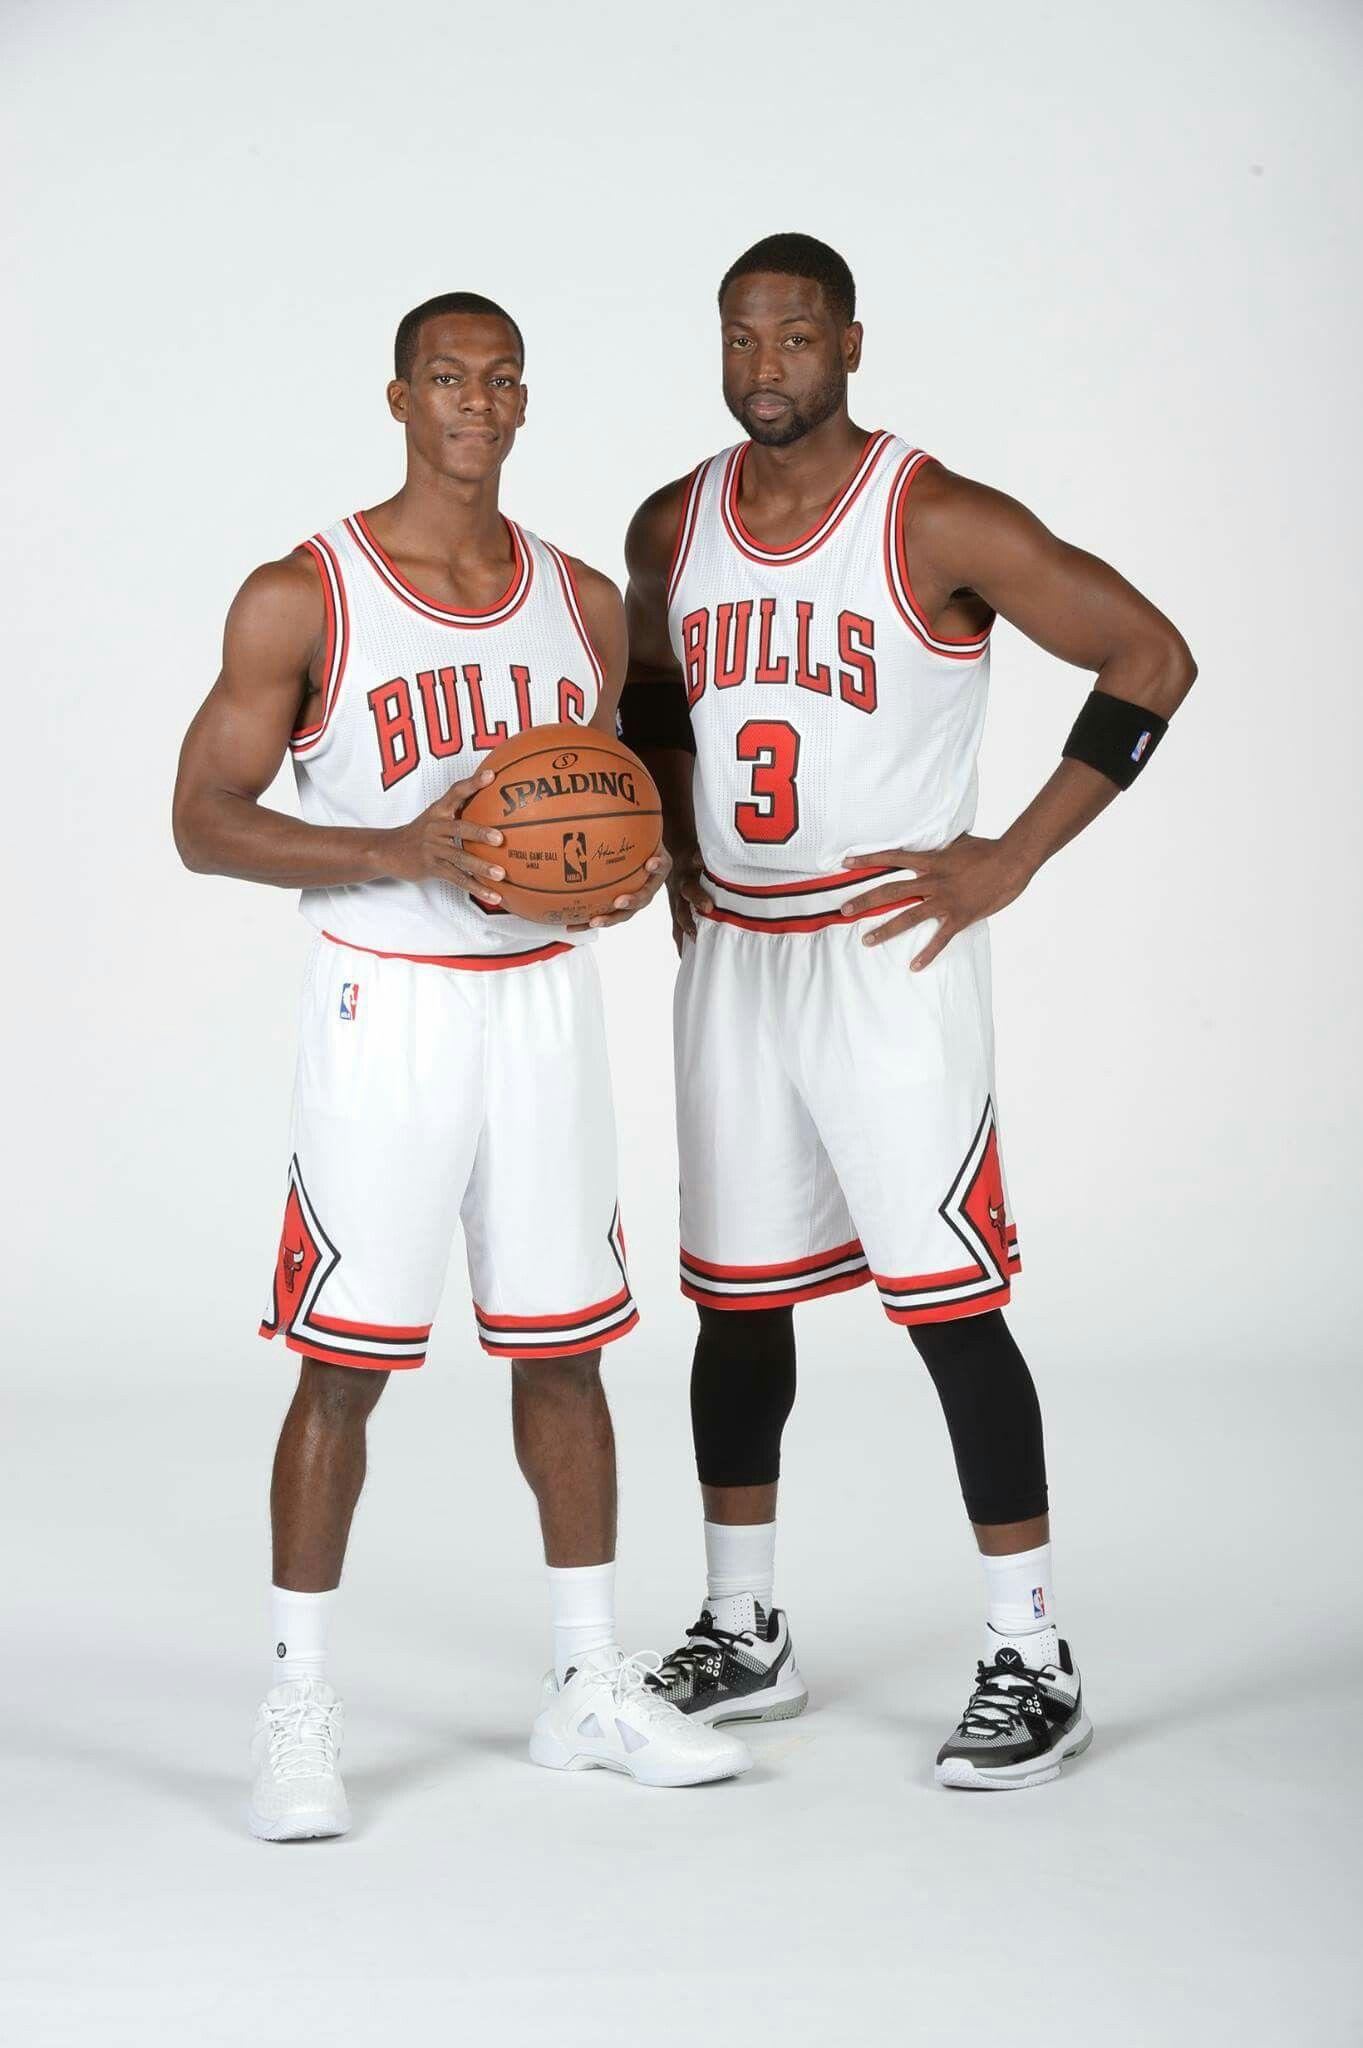 bd400866ba8f Veteran NBA champions and Chicago Bulls backcourt Rajon Rondo and Dwyane  Wade